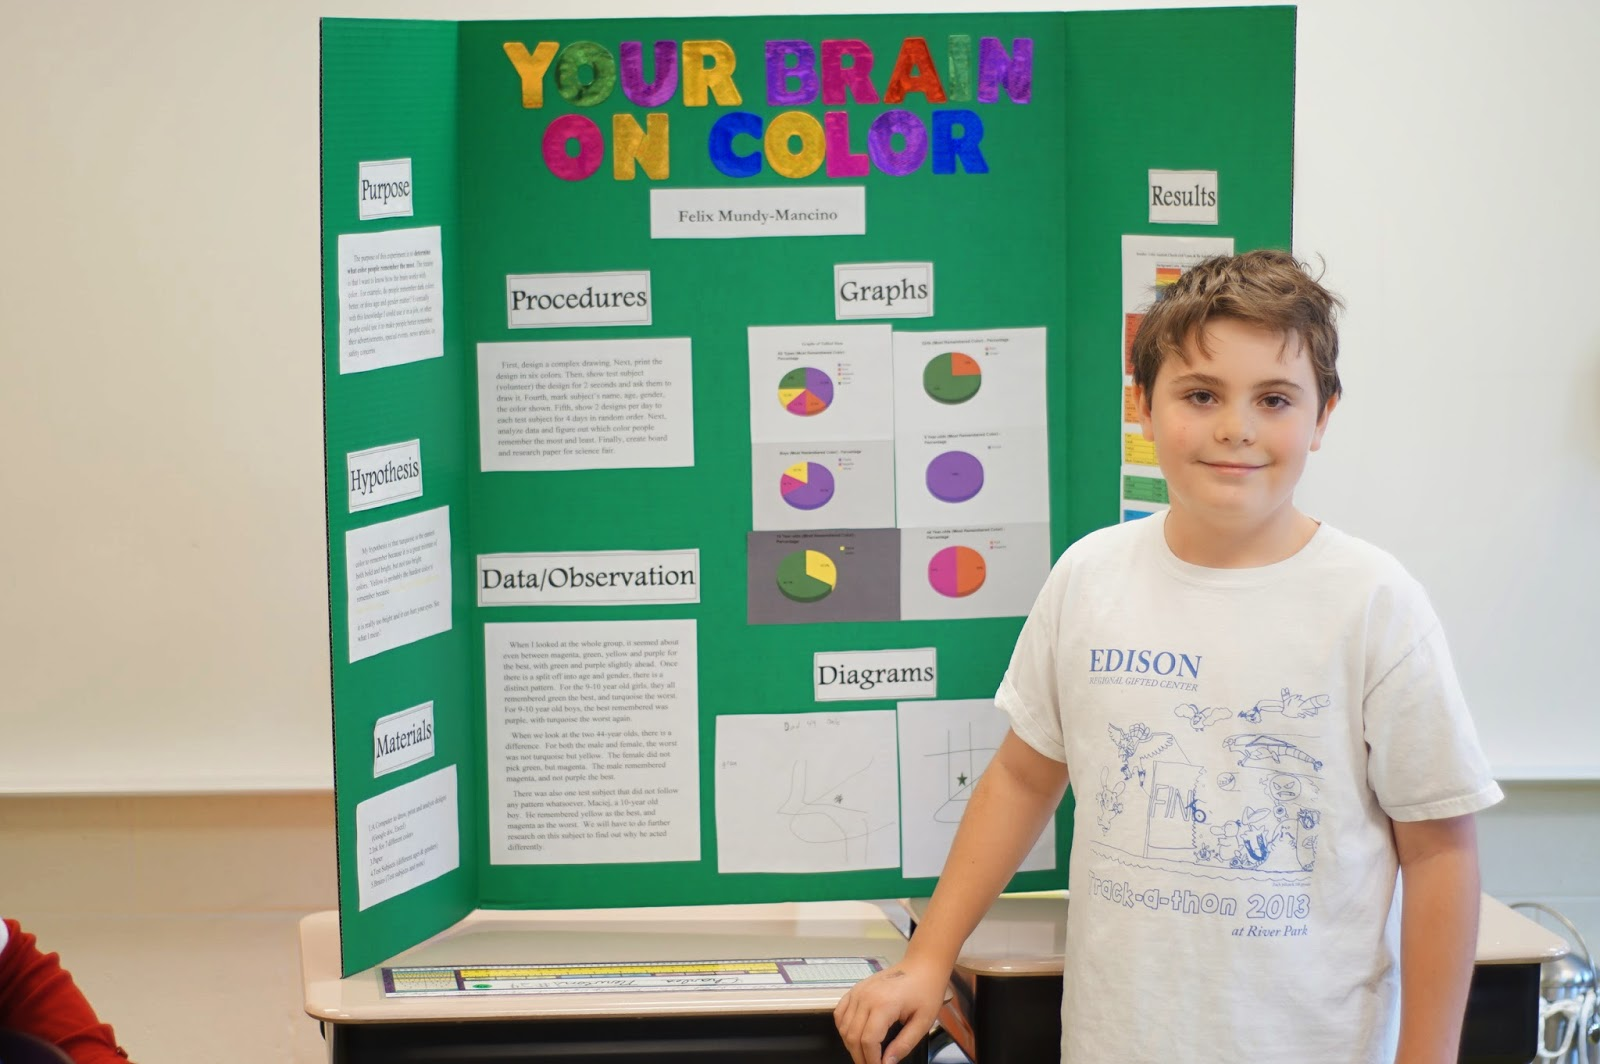 portkey 217 science fair presentations off to a terrific start